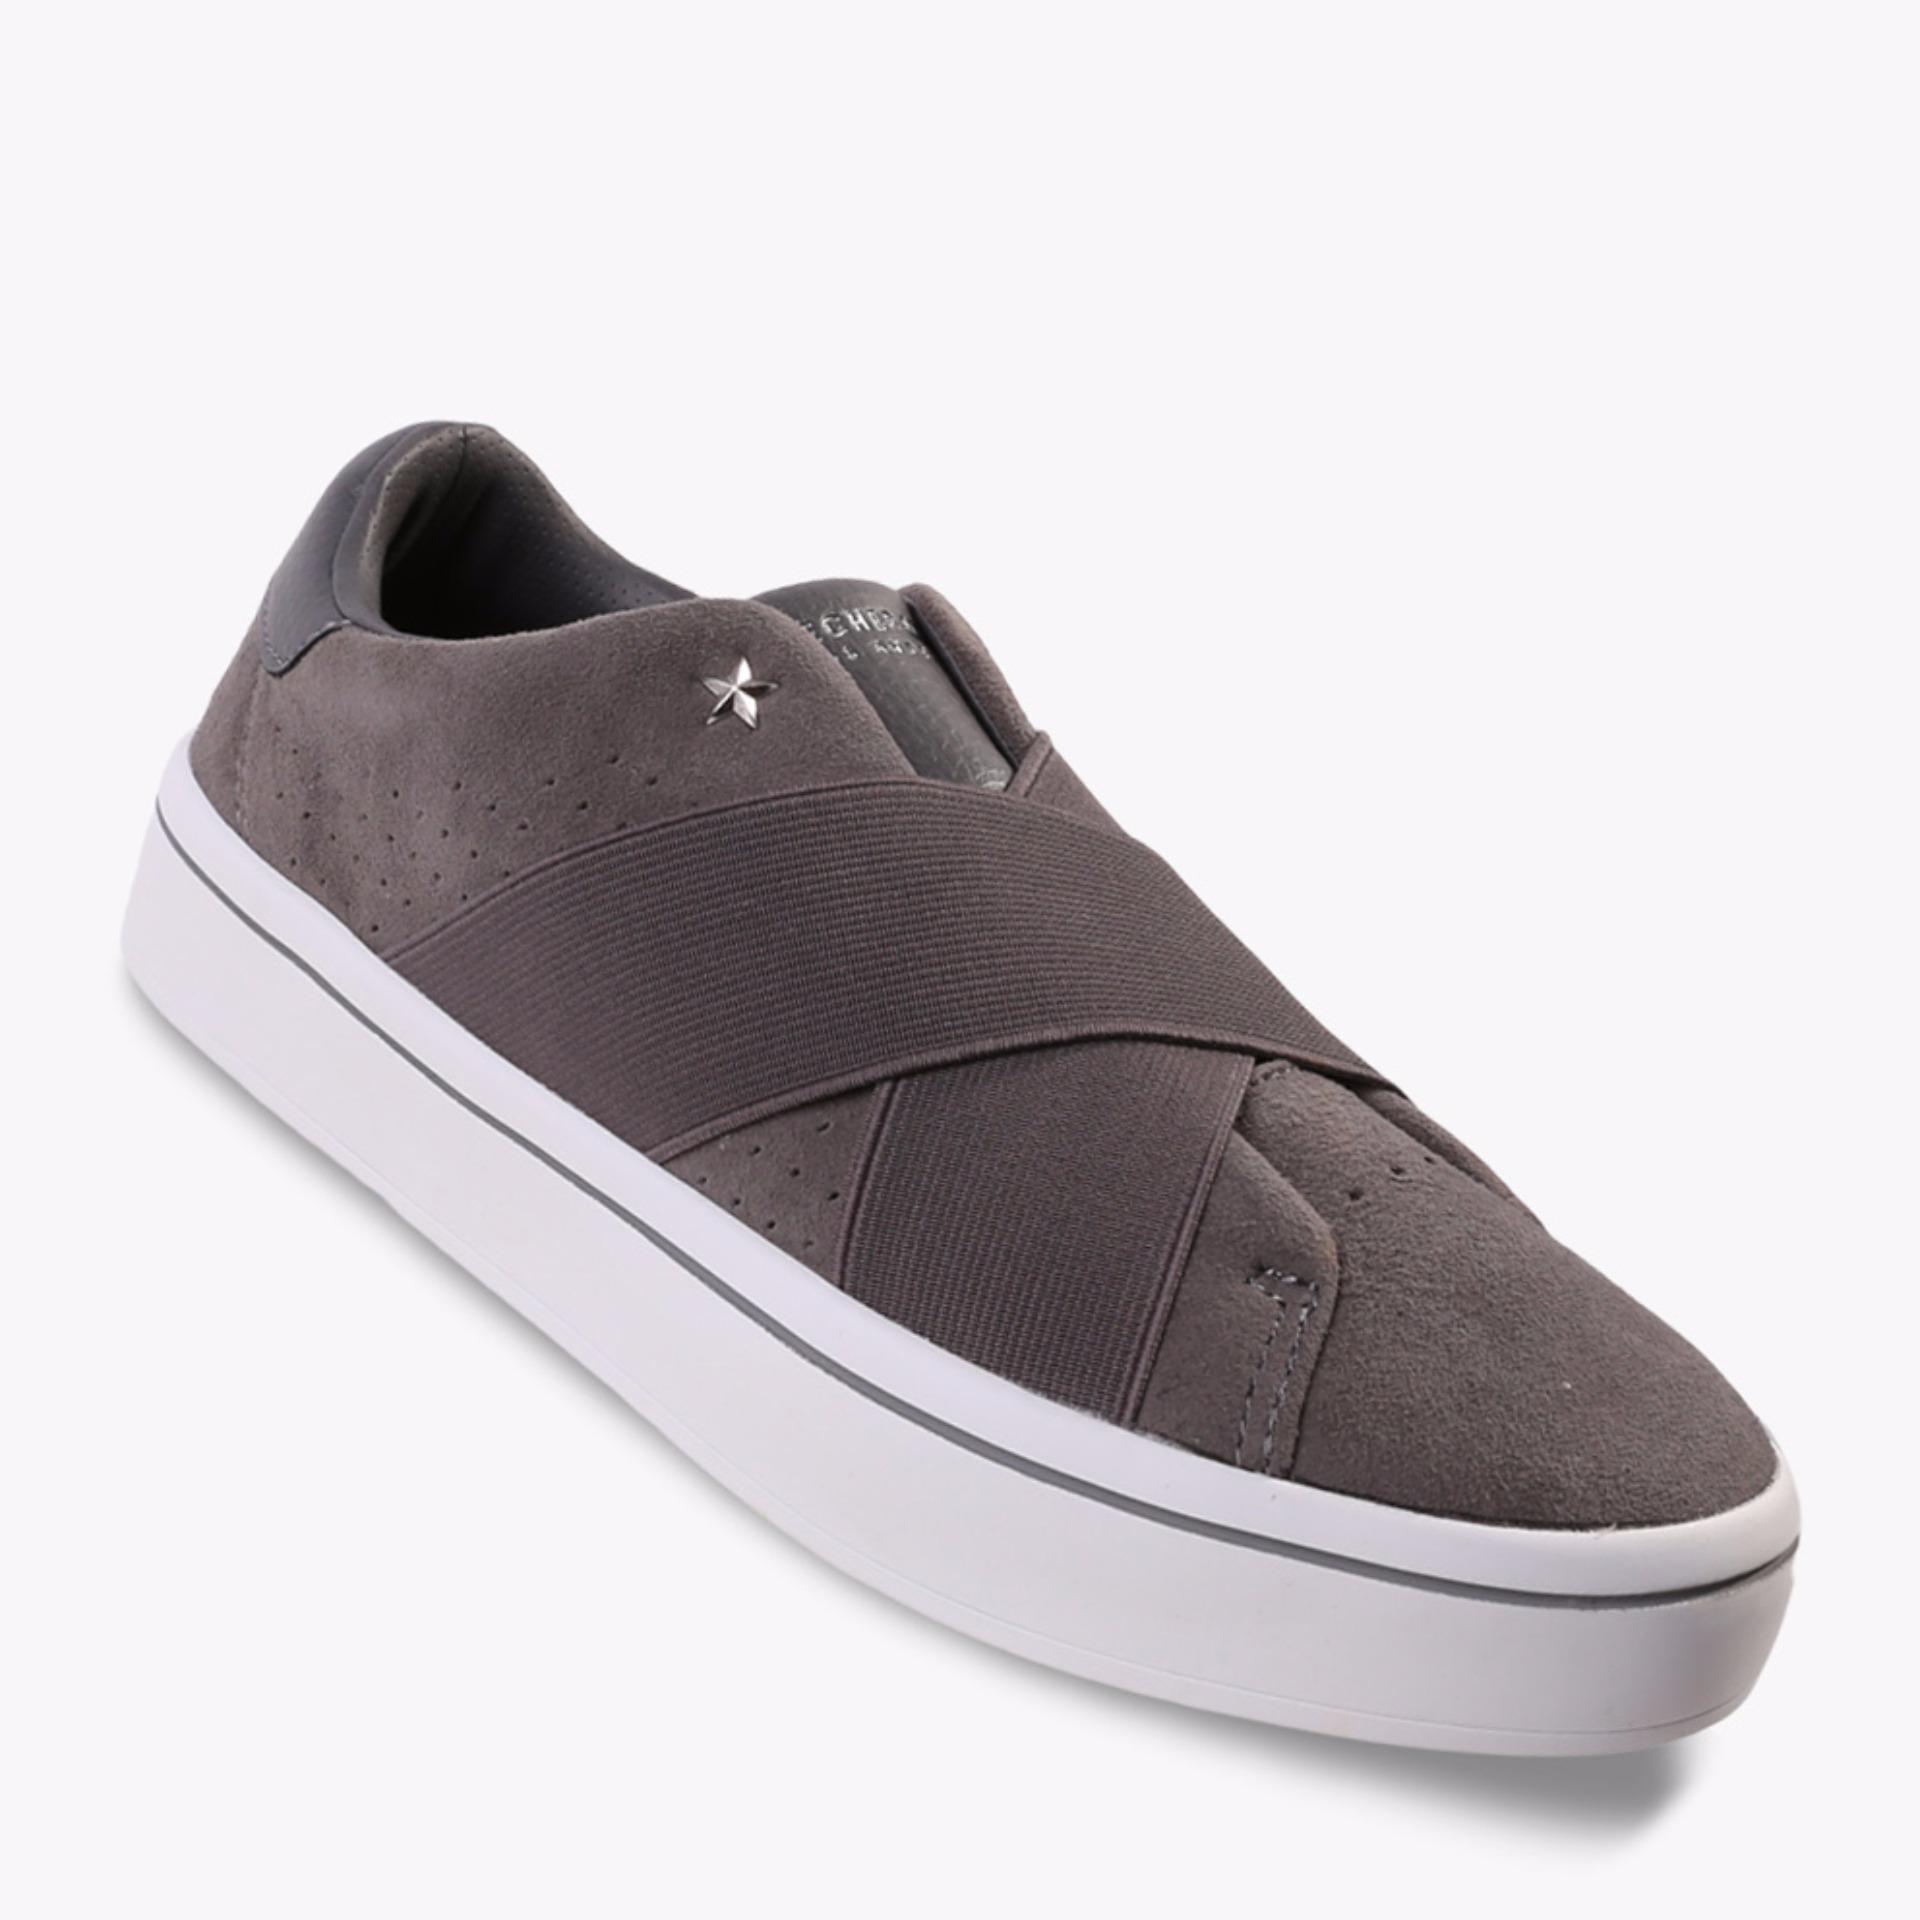 Diskon Skechers Hi Lites Street Crossers Women S Sneakers Shoes Abu Abu Skechers Di Indonesia